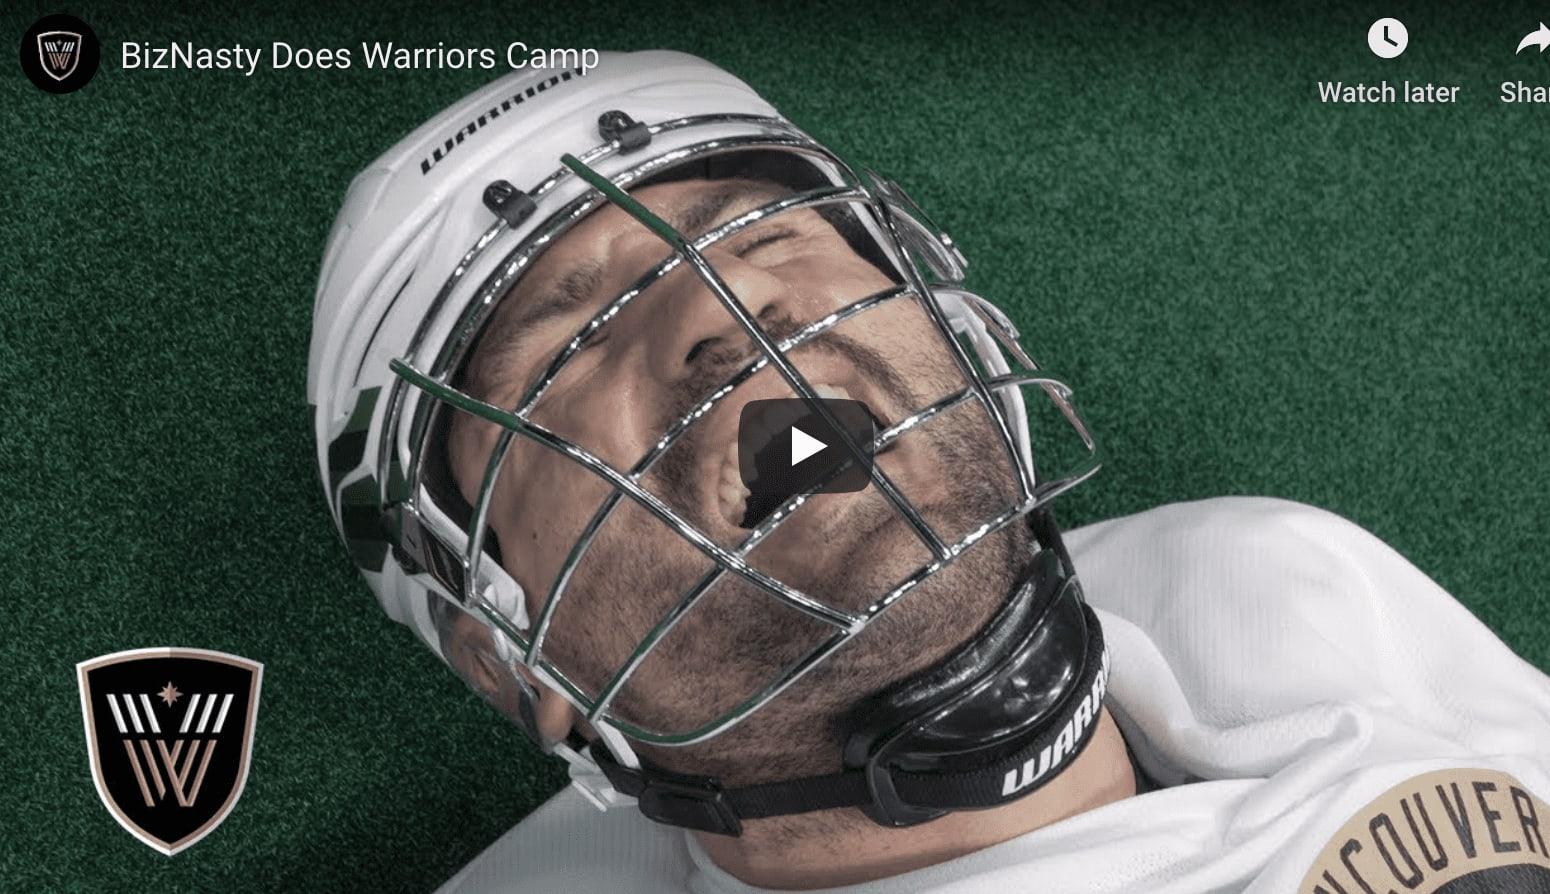 biz nasty does camp pro lacrosse box lacrosse nll national lacrosse league vancouver warriors